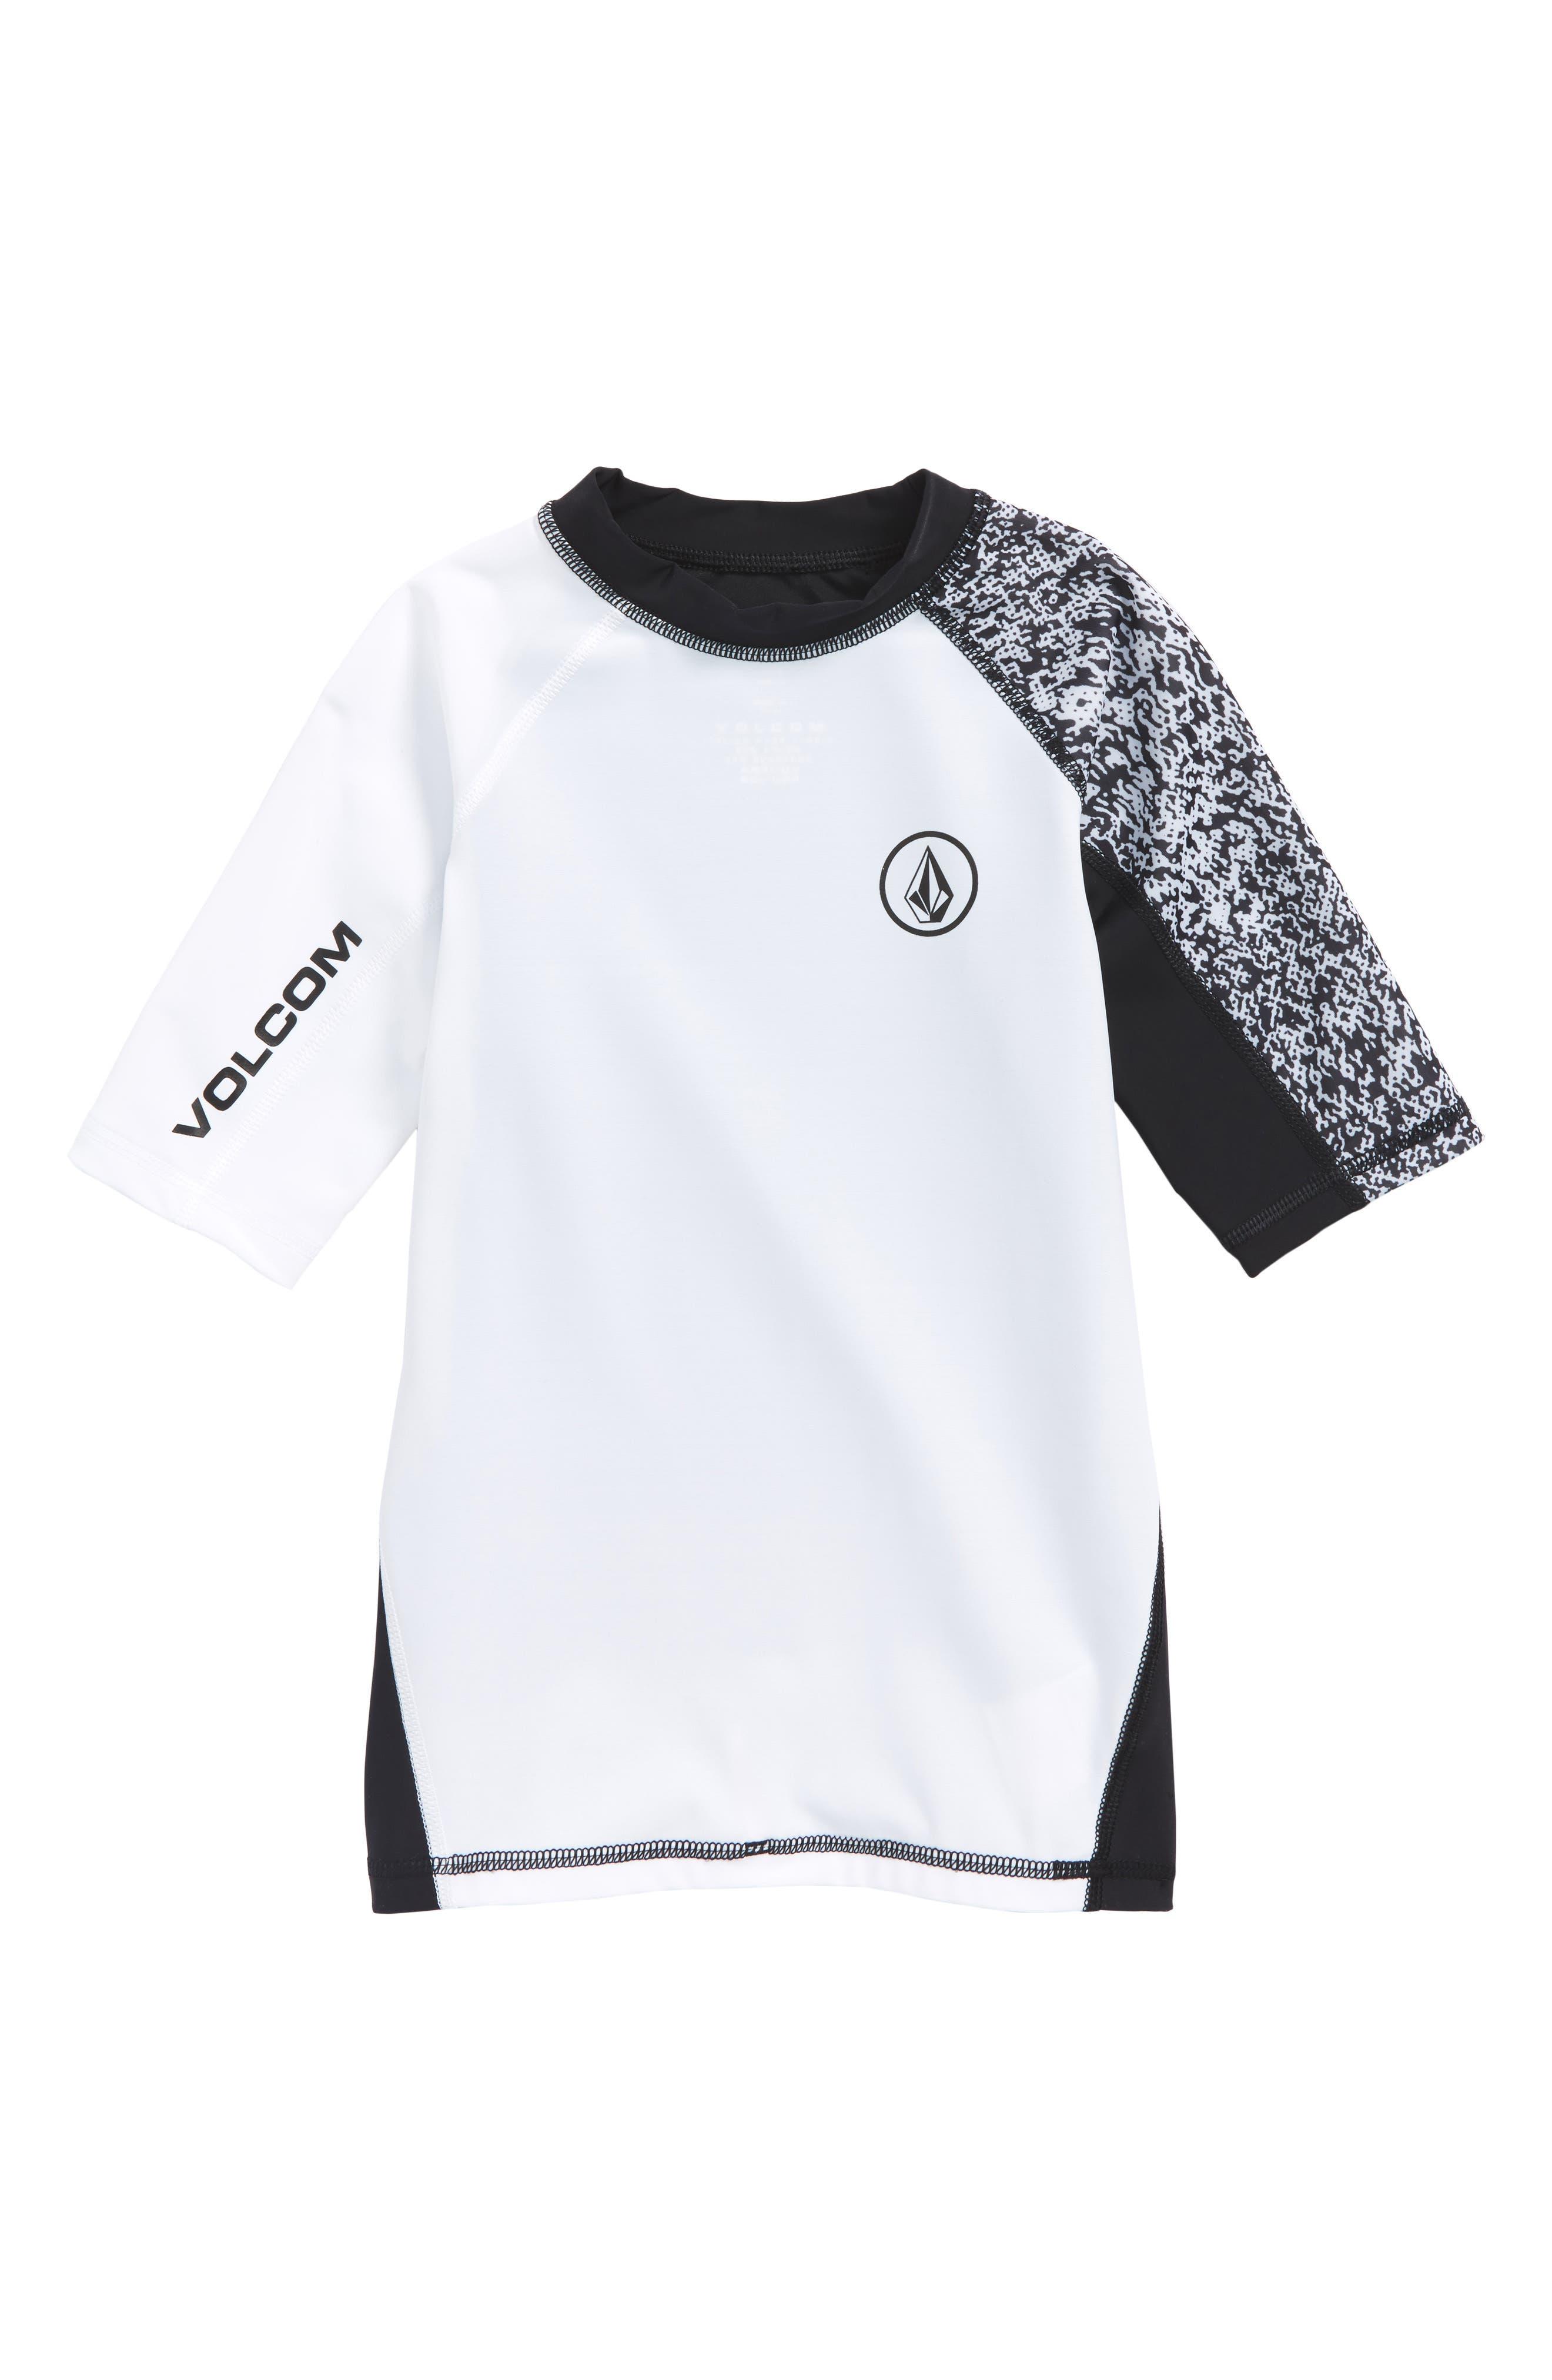 Lido Block Short Sleeve Rashguard,                         Main,                         color, 100